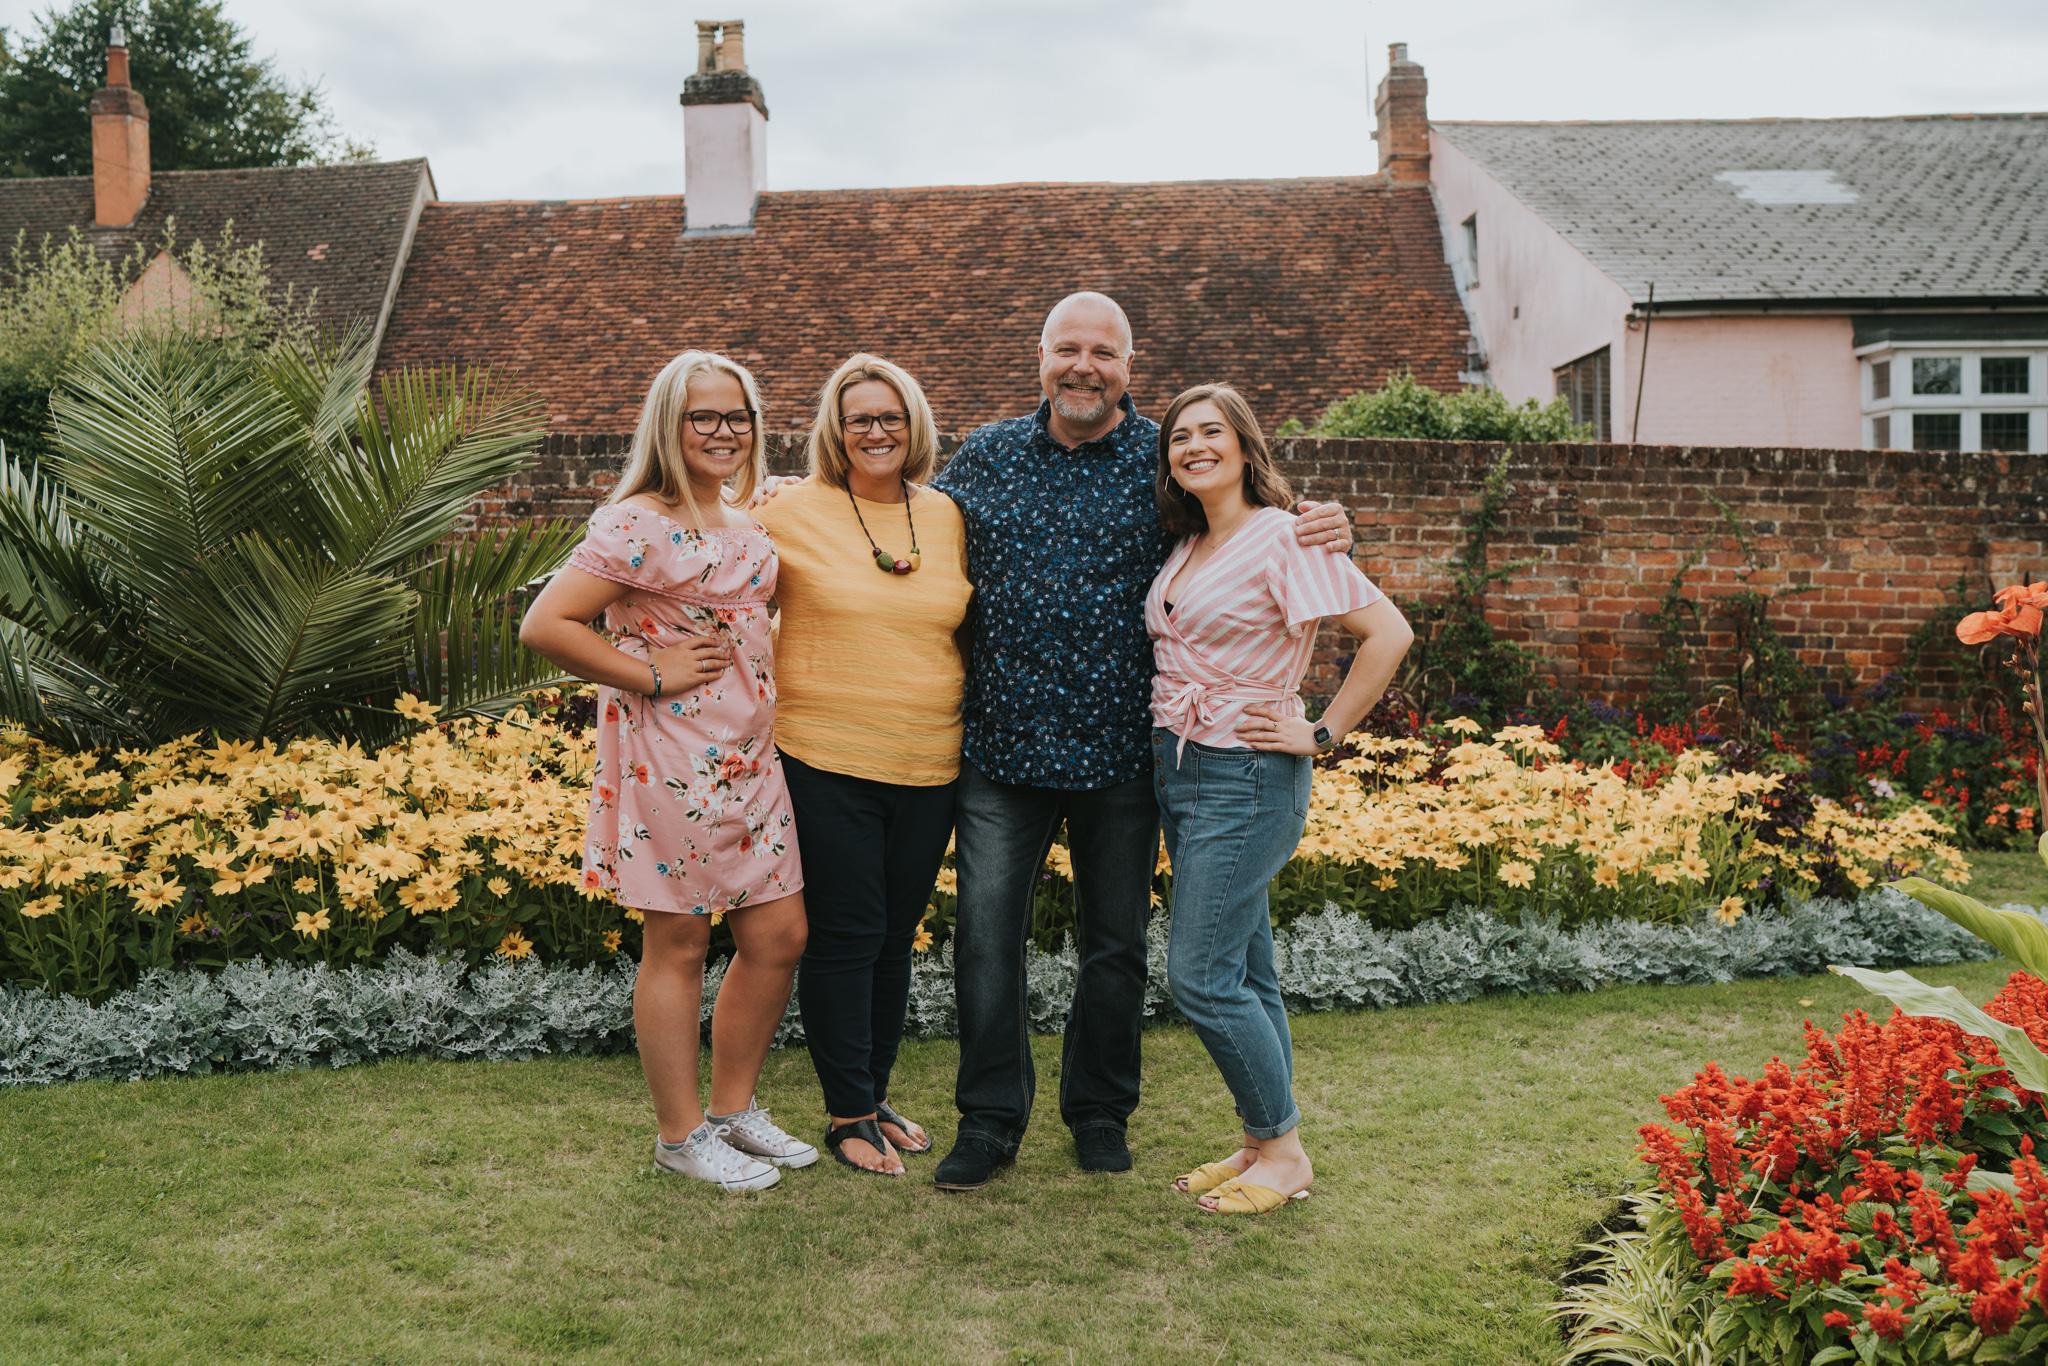 Fitch-Family-Colchester-Castle-Park-Grace-Elizabeth-Alternative-Wedding-Lifestyle-Photographer-Colchester-Essex-Suffolk-Norfolk-Devon (1 of 41).jpg